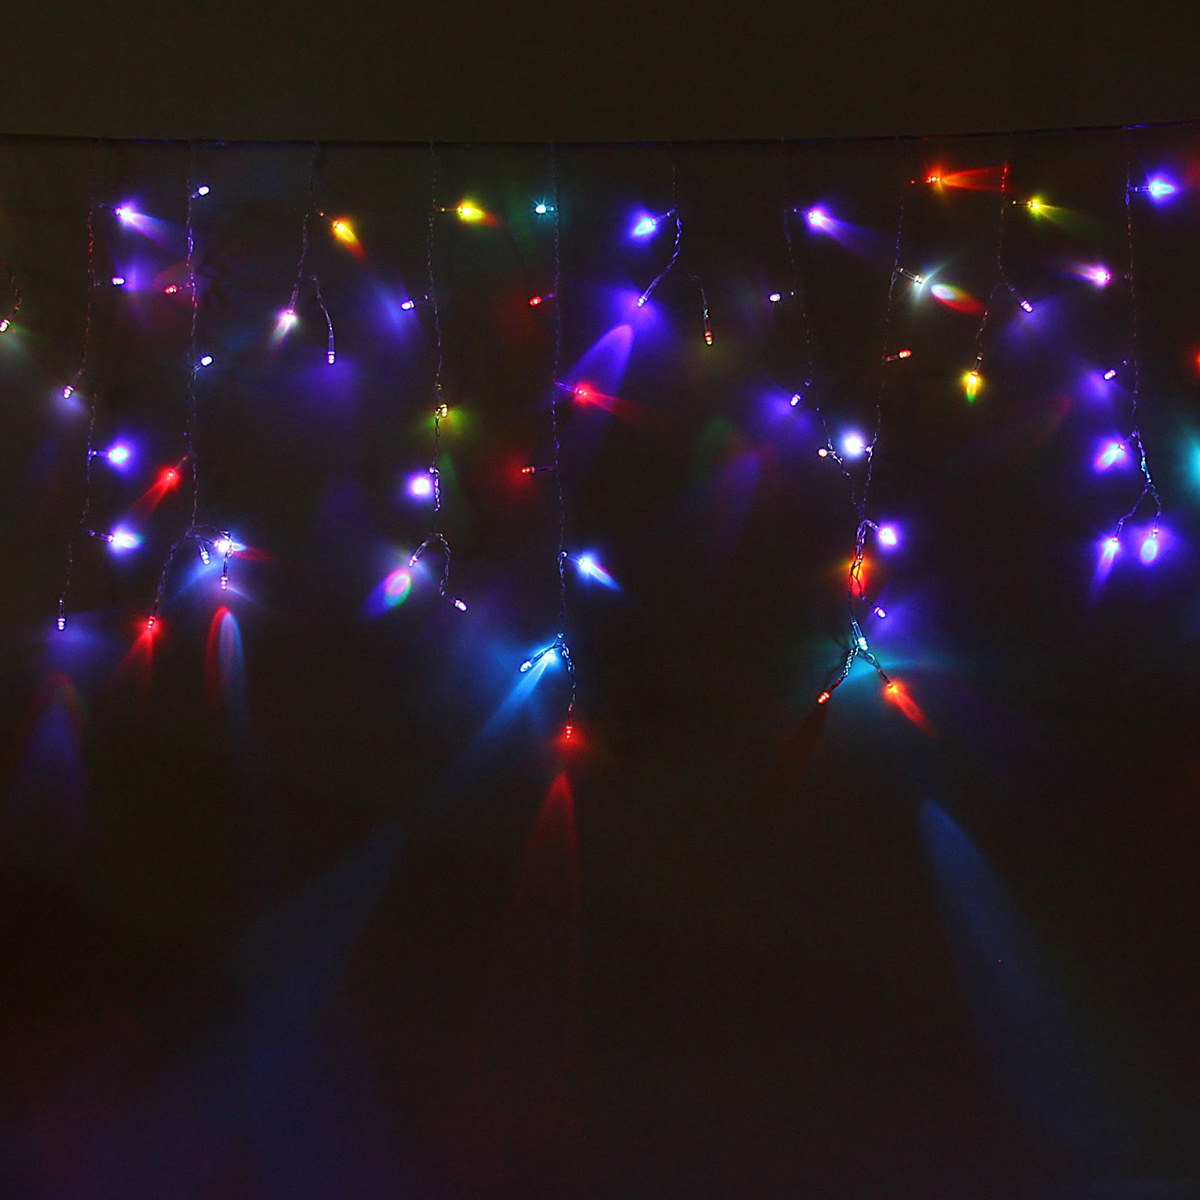 Гирлянда светодиодная Luazon Бахрома, моргает, 299 ламп, 220 V, 5,2 х 0,6 м, цвет: мультиколор. 1080427 гирлянда luazon бахрома 1 2m 0 6m multicolor rgb 1080411